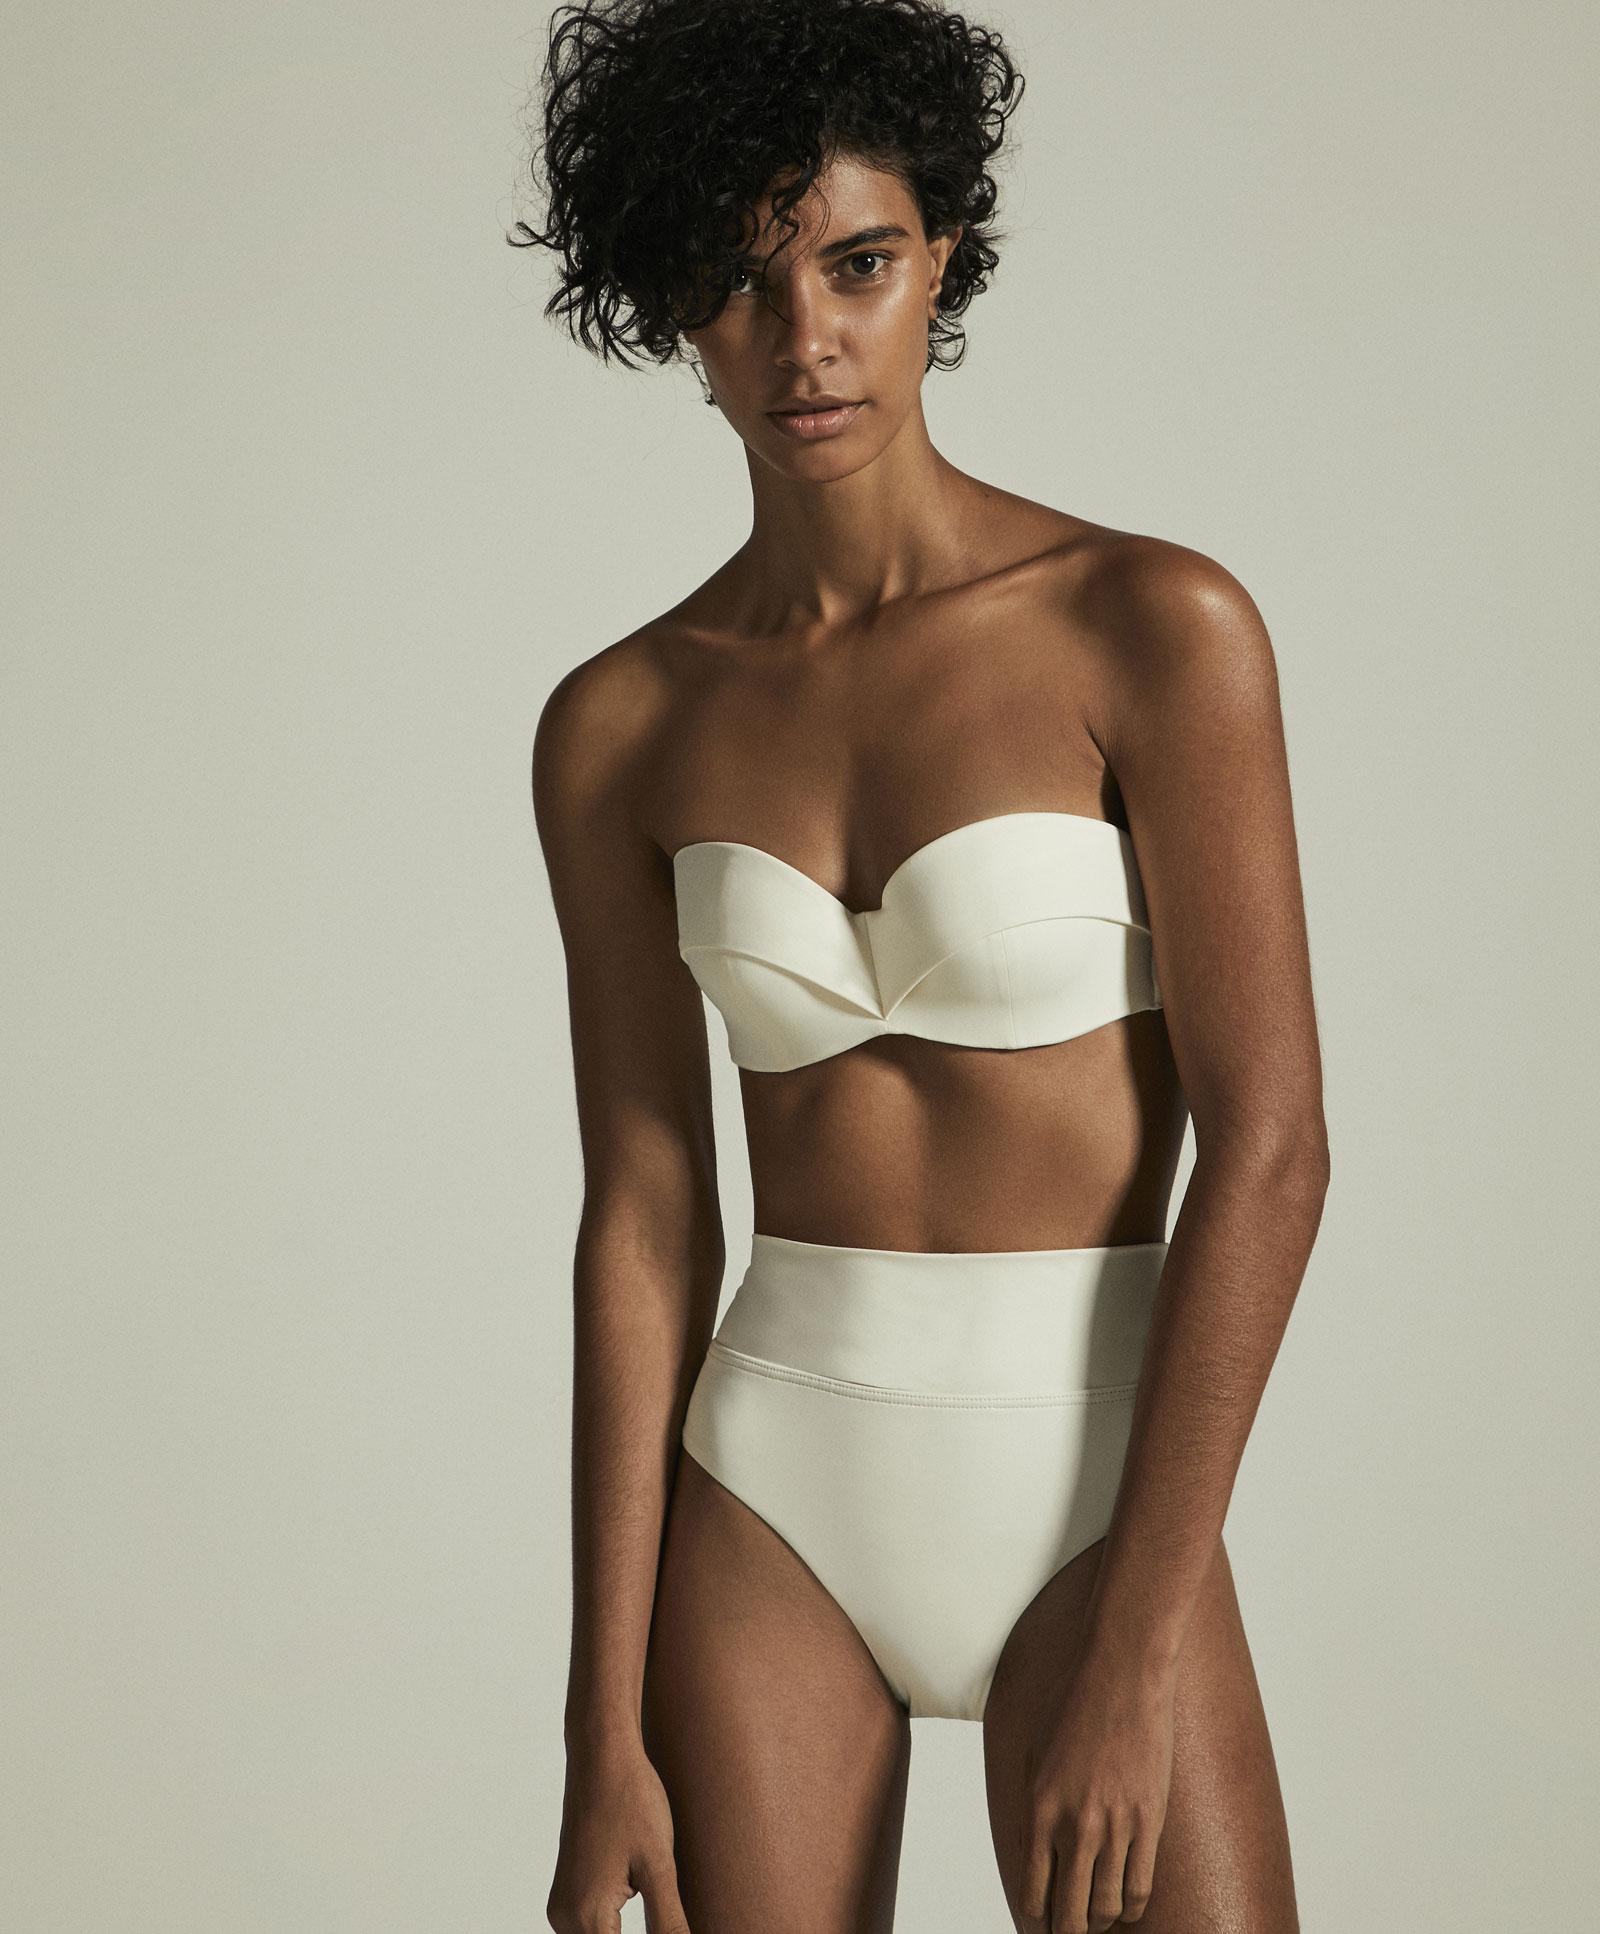 Costume bianco Oysho a vita alta con fascia a 22,99 euro e slip a 14,99 euro